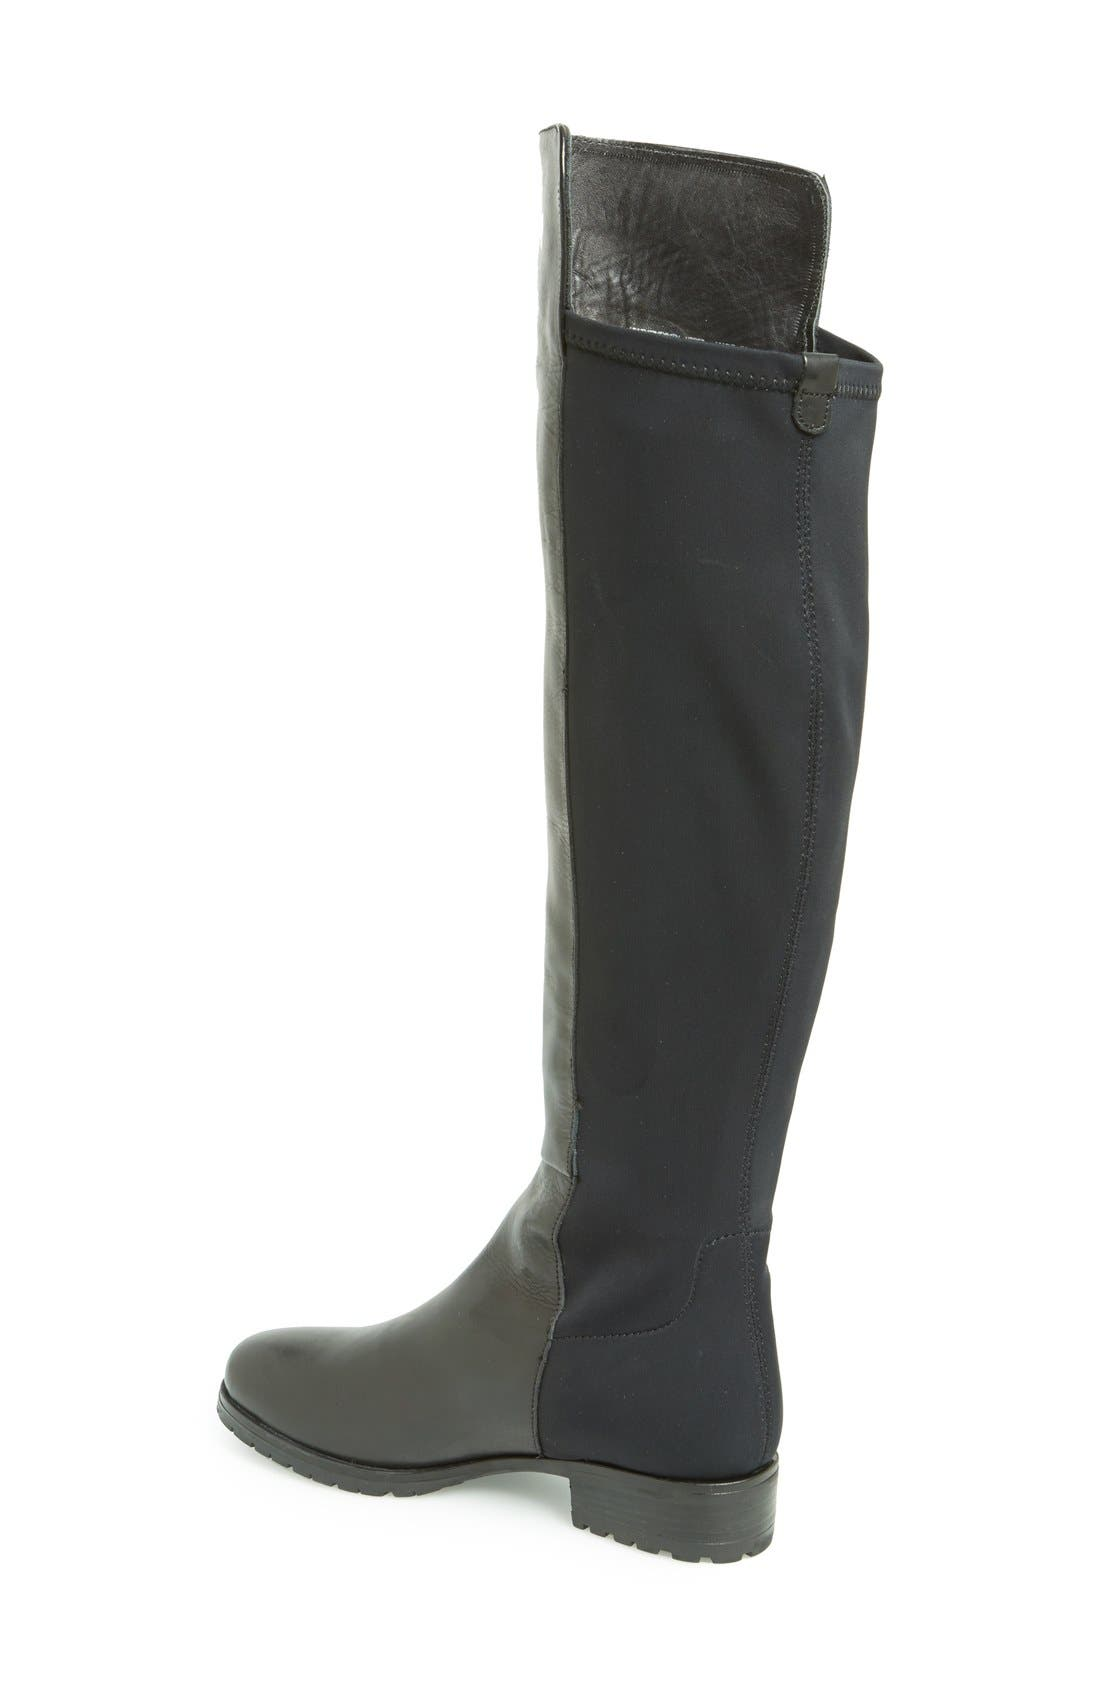 Alternate Image 2  - Dune London 'Trishy' Over the Knee Boot (Women)